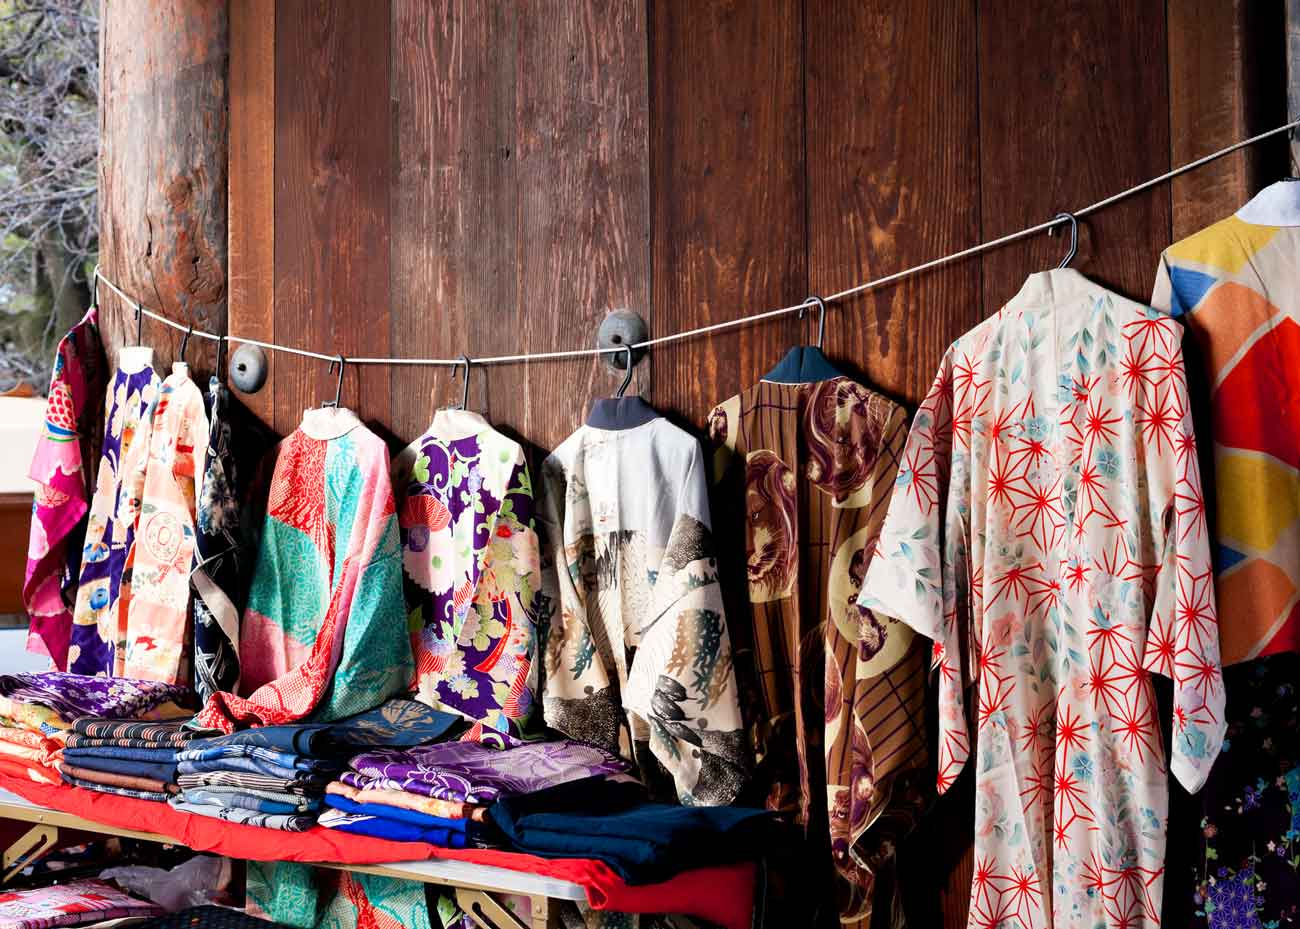 ©  Peter Rabbit  / Flickr Creative Commons, Kimono at the Flea Market